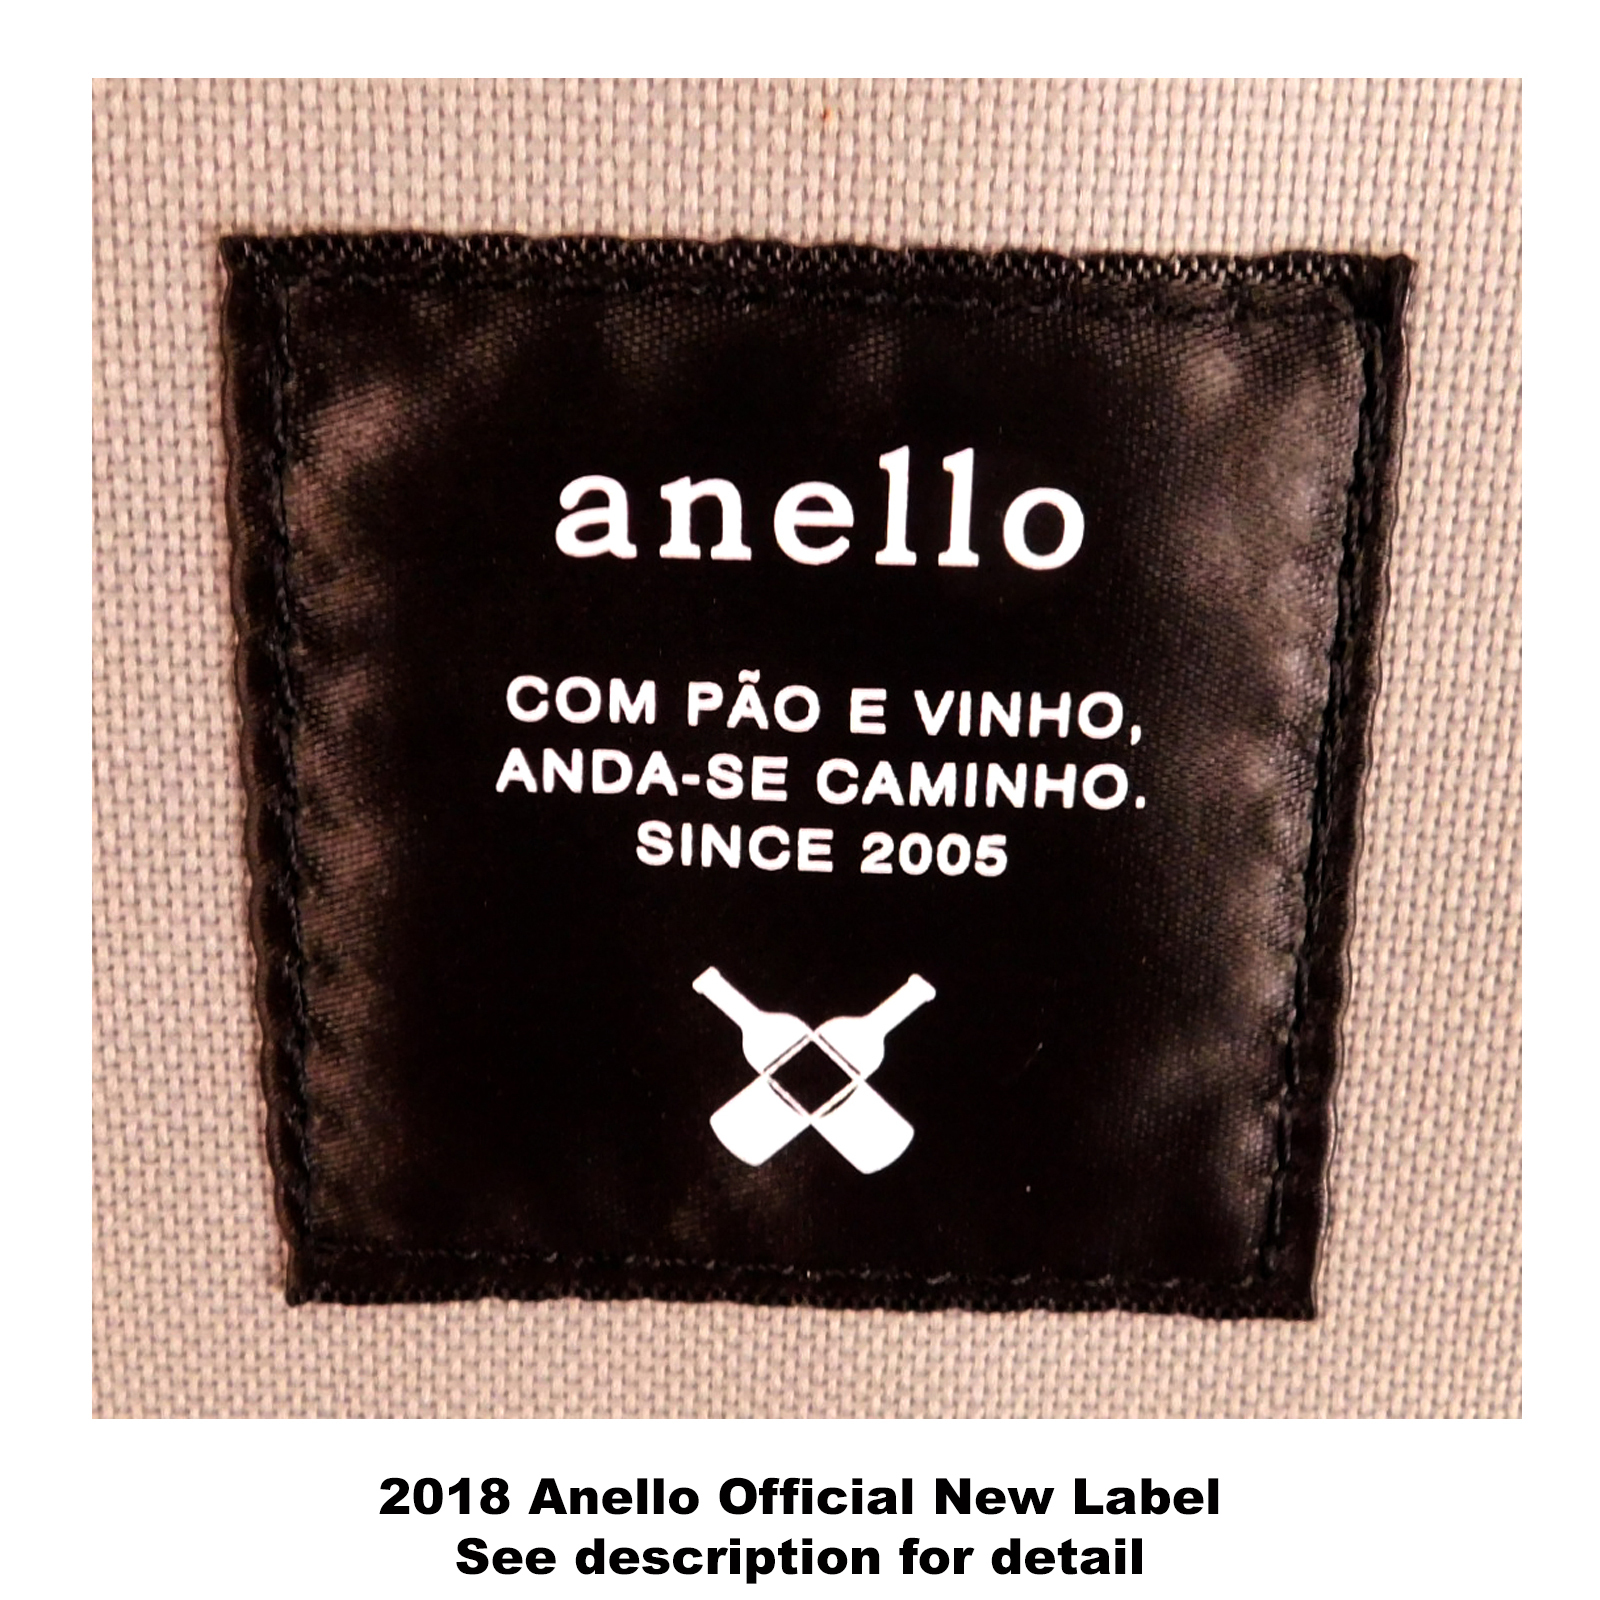 Anello Official Japan Light Grey Regular Backpack Rucksack Diaper Travel Bag image 3